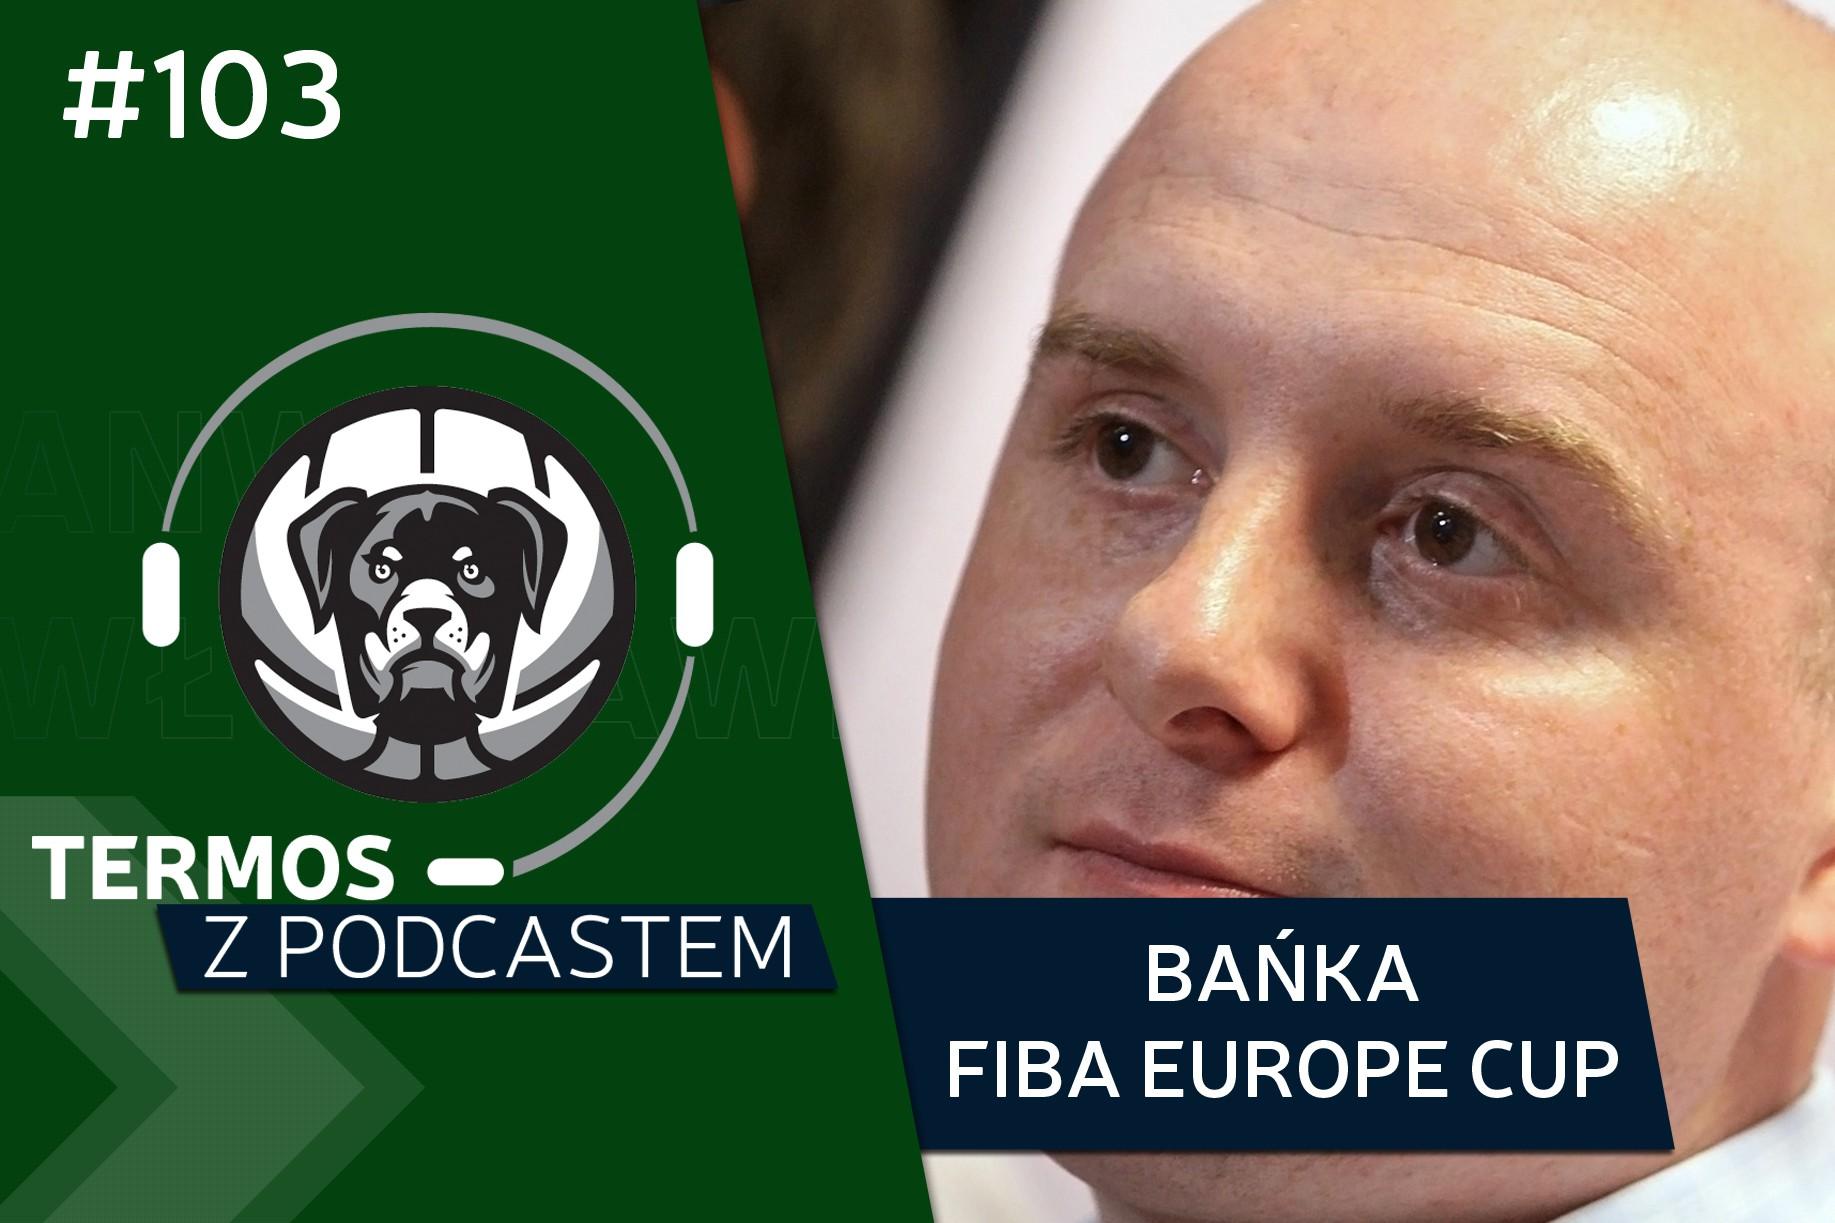 Termos z Podcastem #103: Bańka FIBA Europe Cup